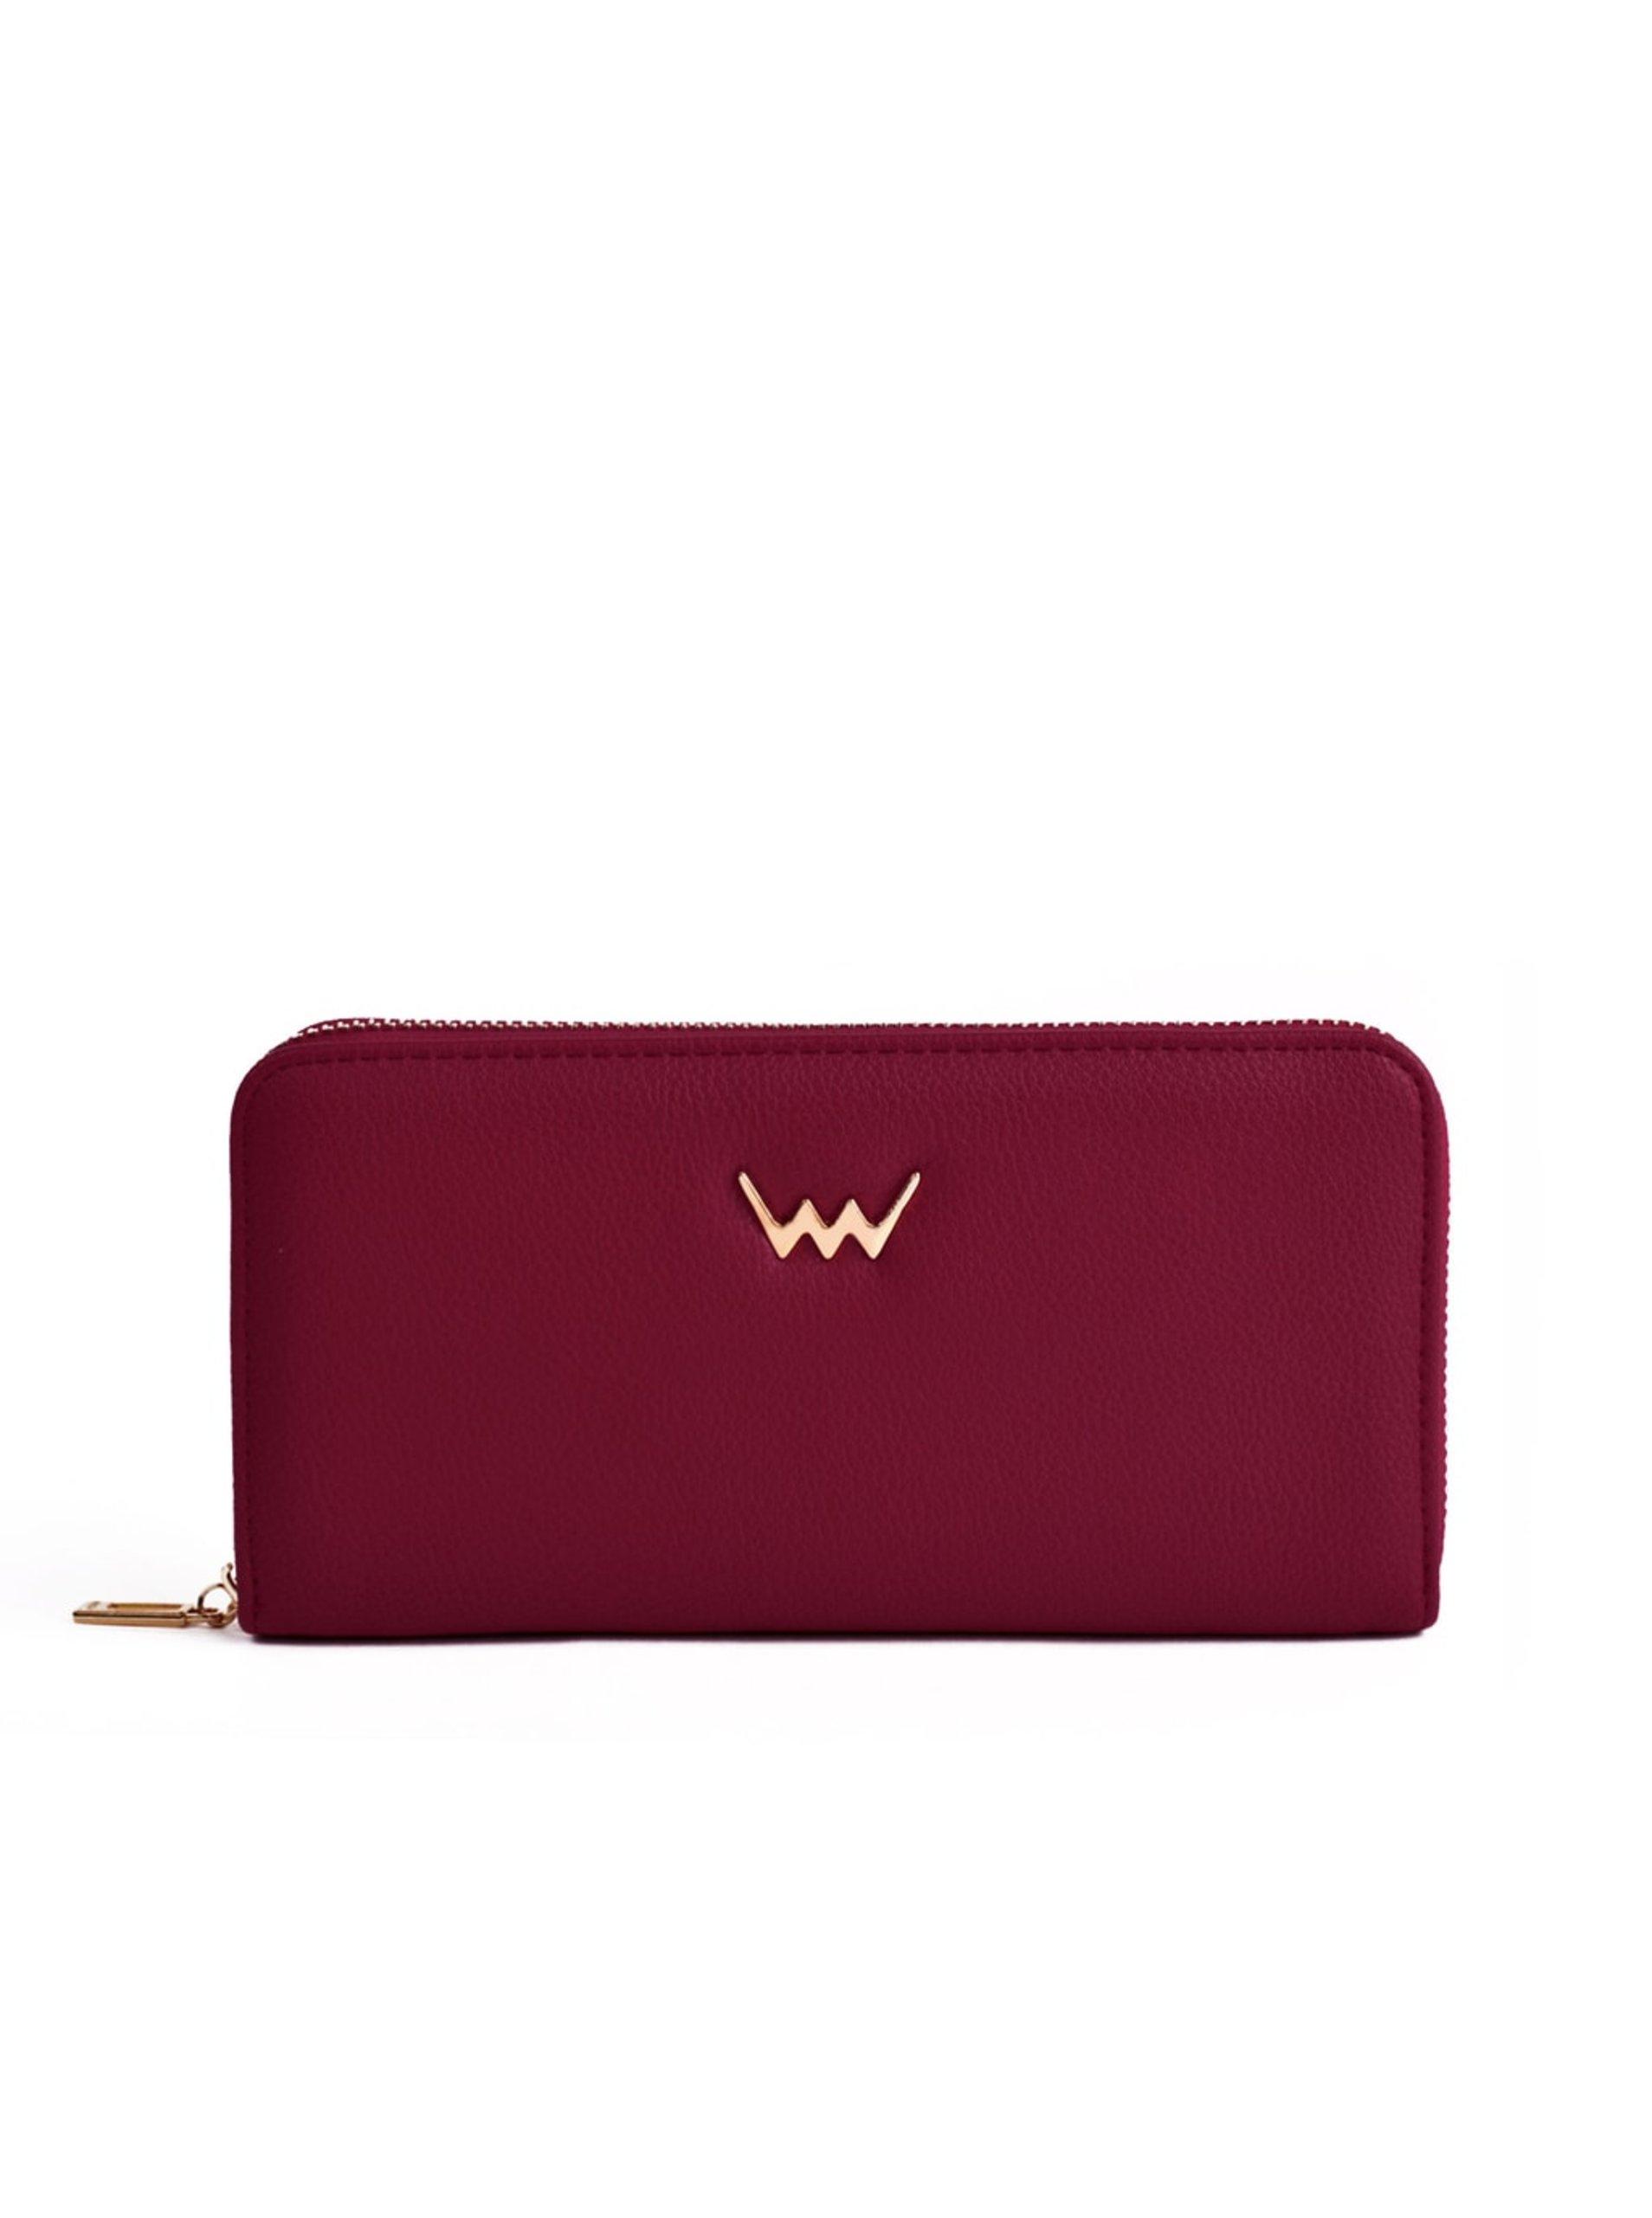 E-shop Vuch peněženka Violetie Vida